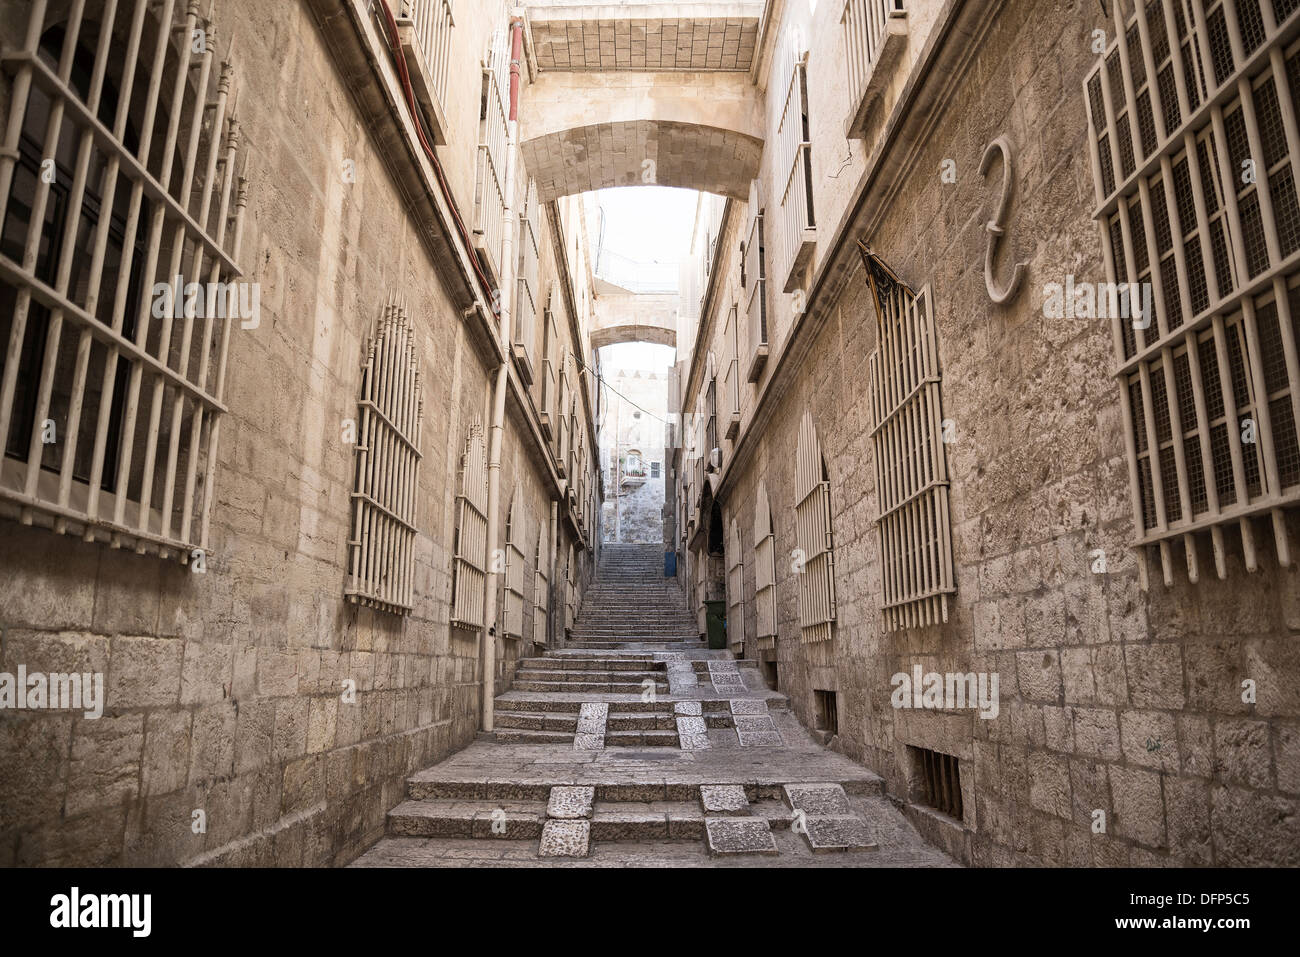 street in jerusalem old town in israel - Stock Image